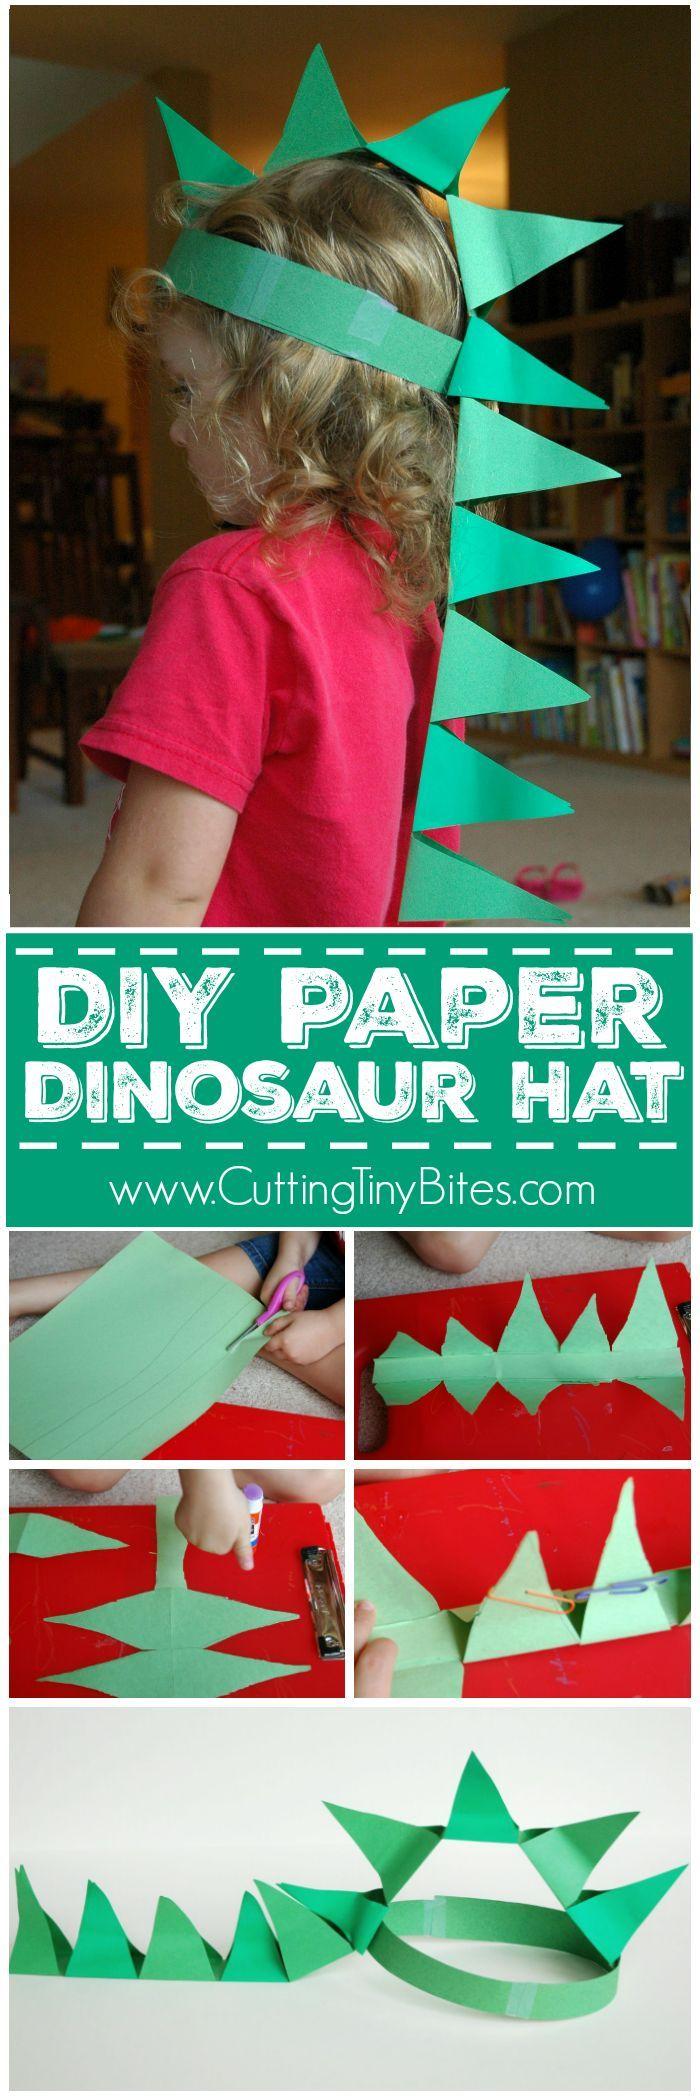 diy paper dinosaur hat simple paper crafts dinosaur hat and